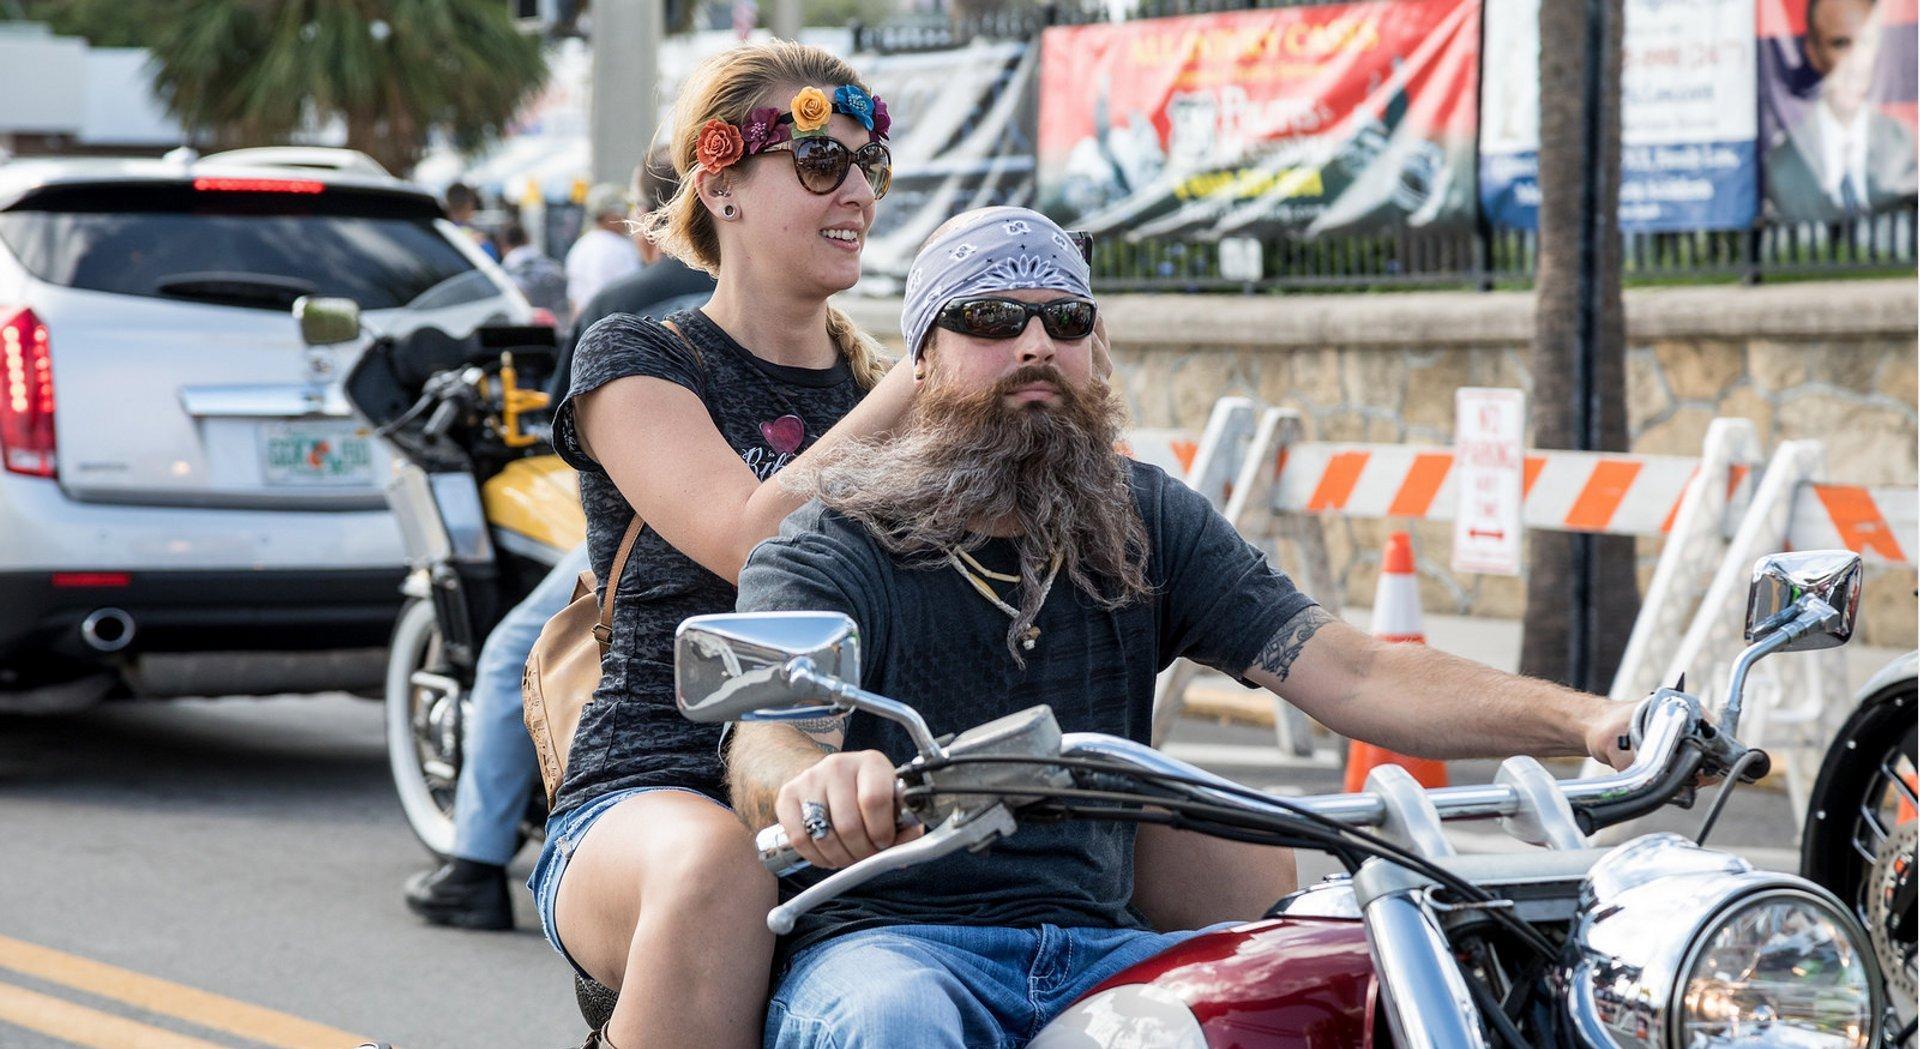 Ohio Bike Week 2020 Schedule Of Events.Daytona Beach Bike Week 2020 In Florida Dates Map